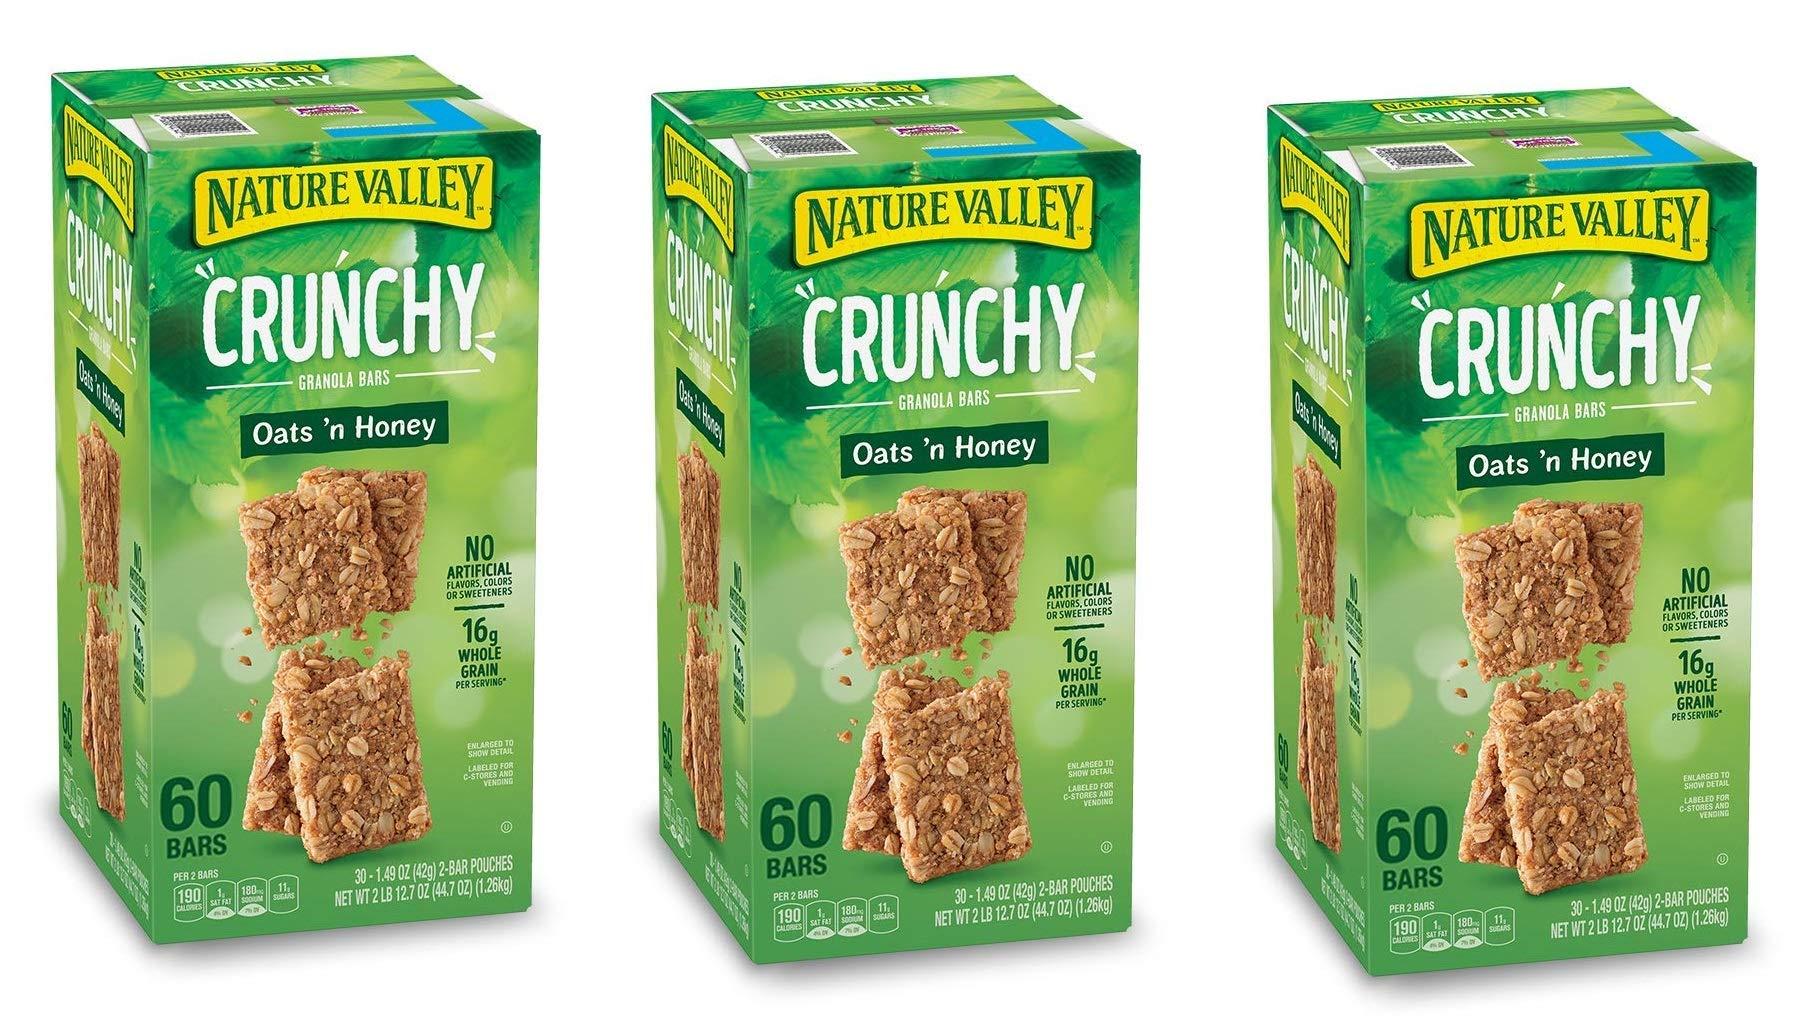 Natures Valley granola bars, Crunchy Oats N Honey, 60 Bars (3 Boxes)